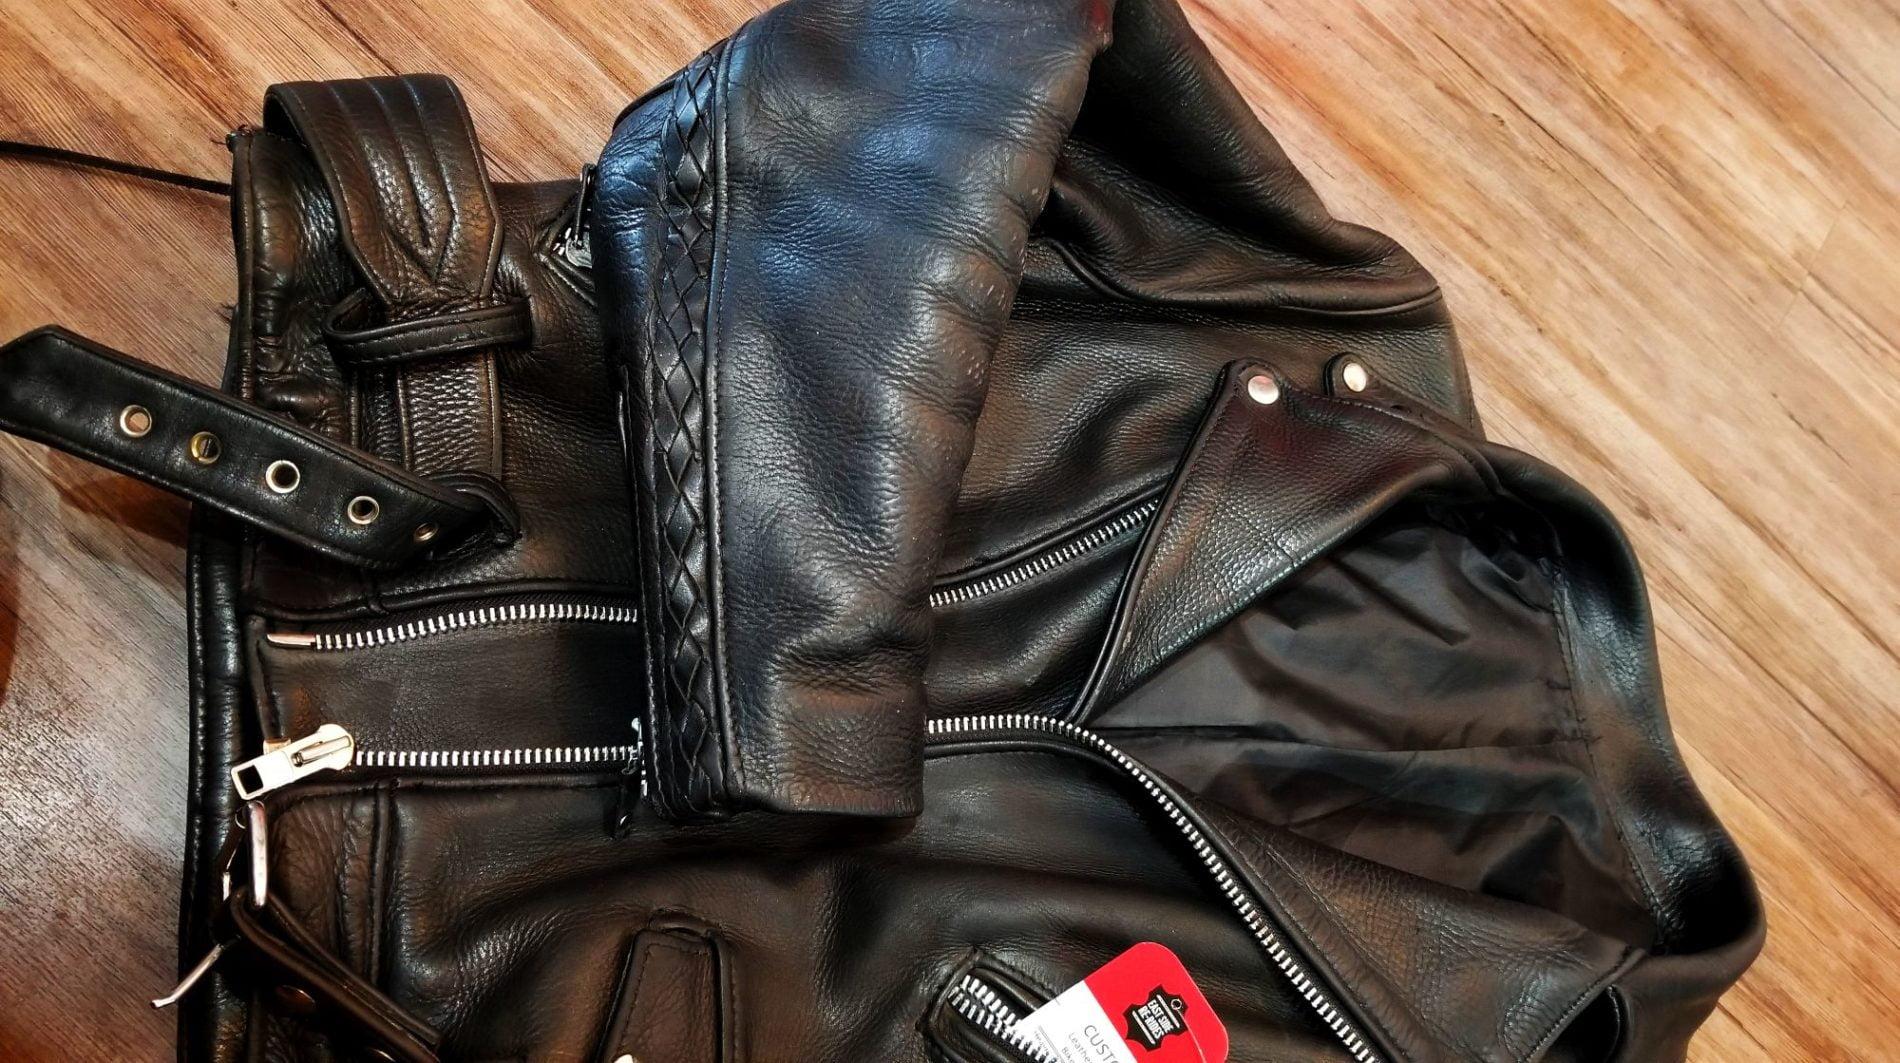 Heaviest leather jacket we've seen ever!